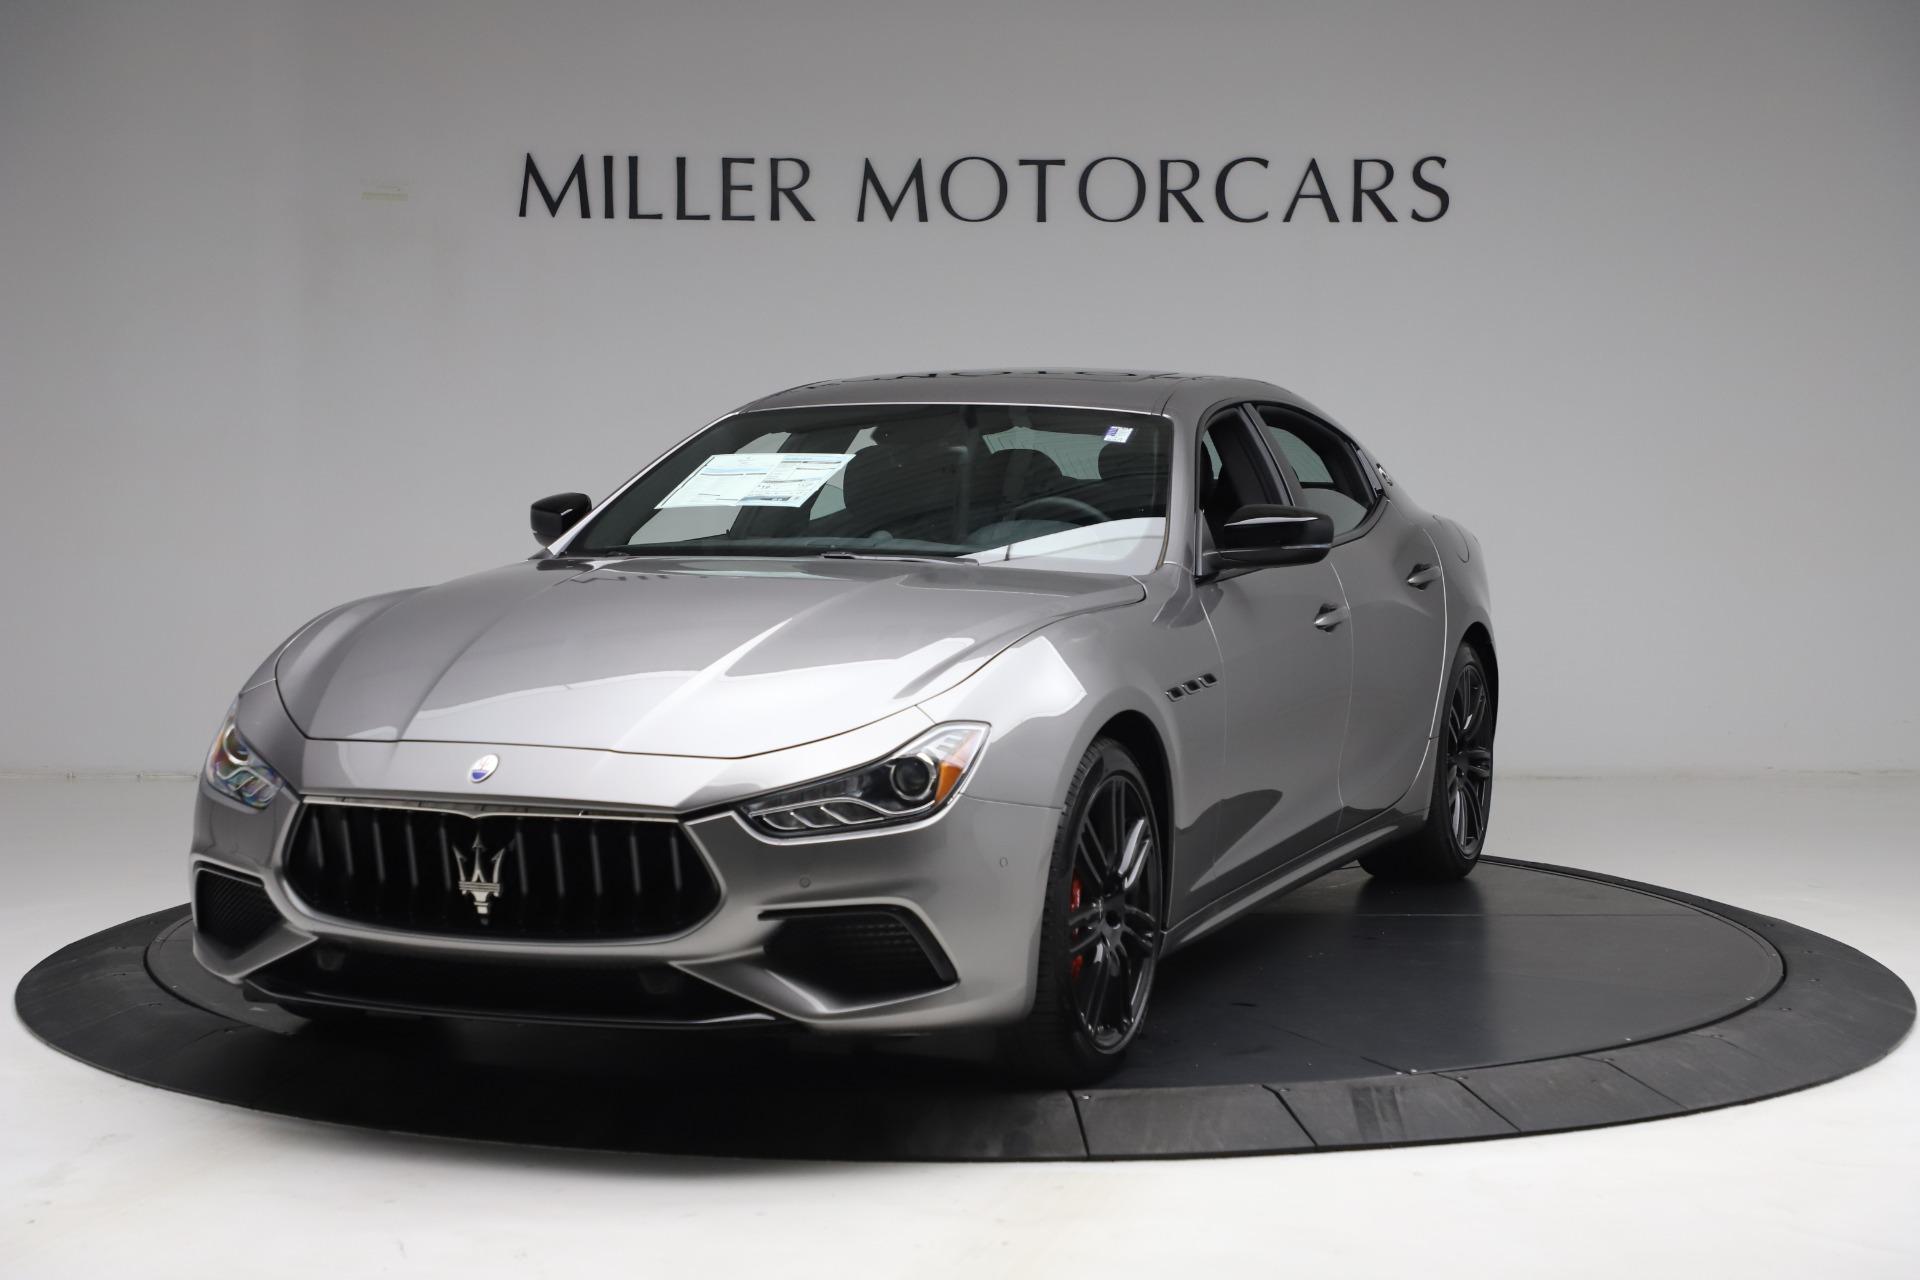 New 2021 Maserati Ghibli S Q4 for sale Sold at Maserati of Greenwich in Greenwich CT 06830 1